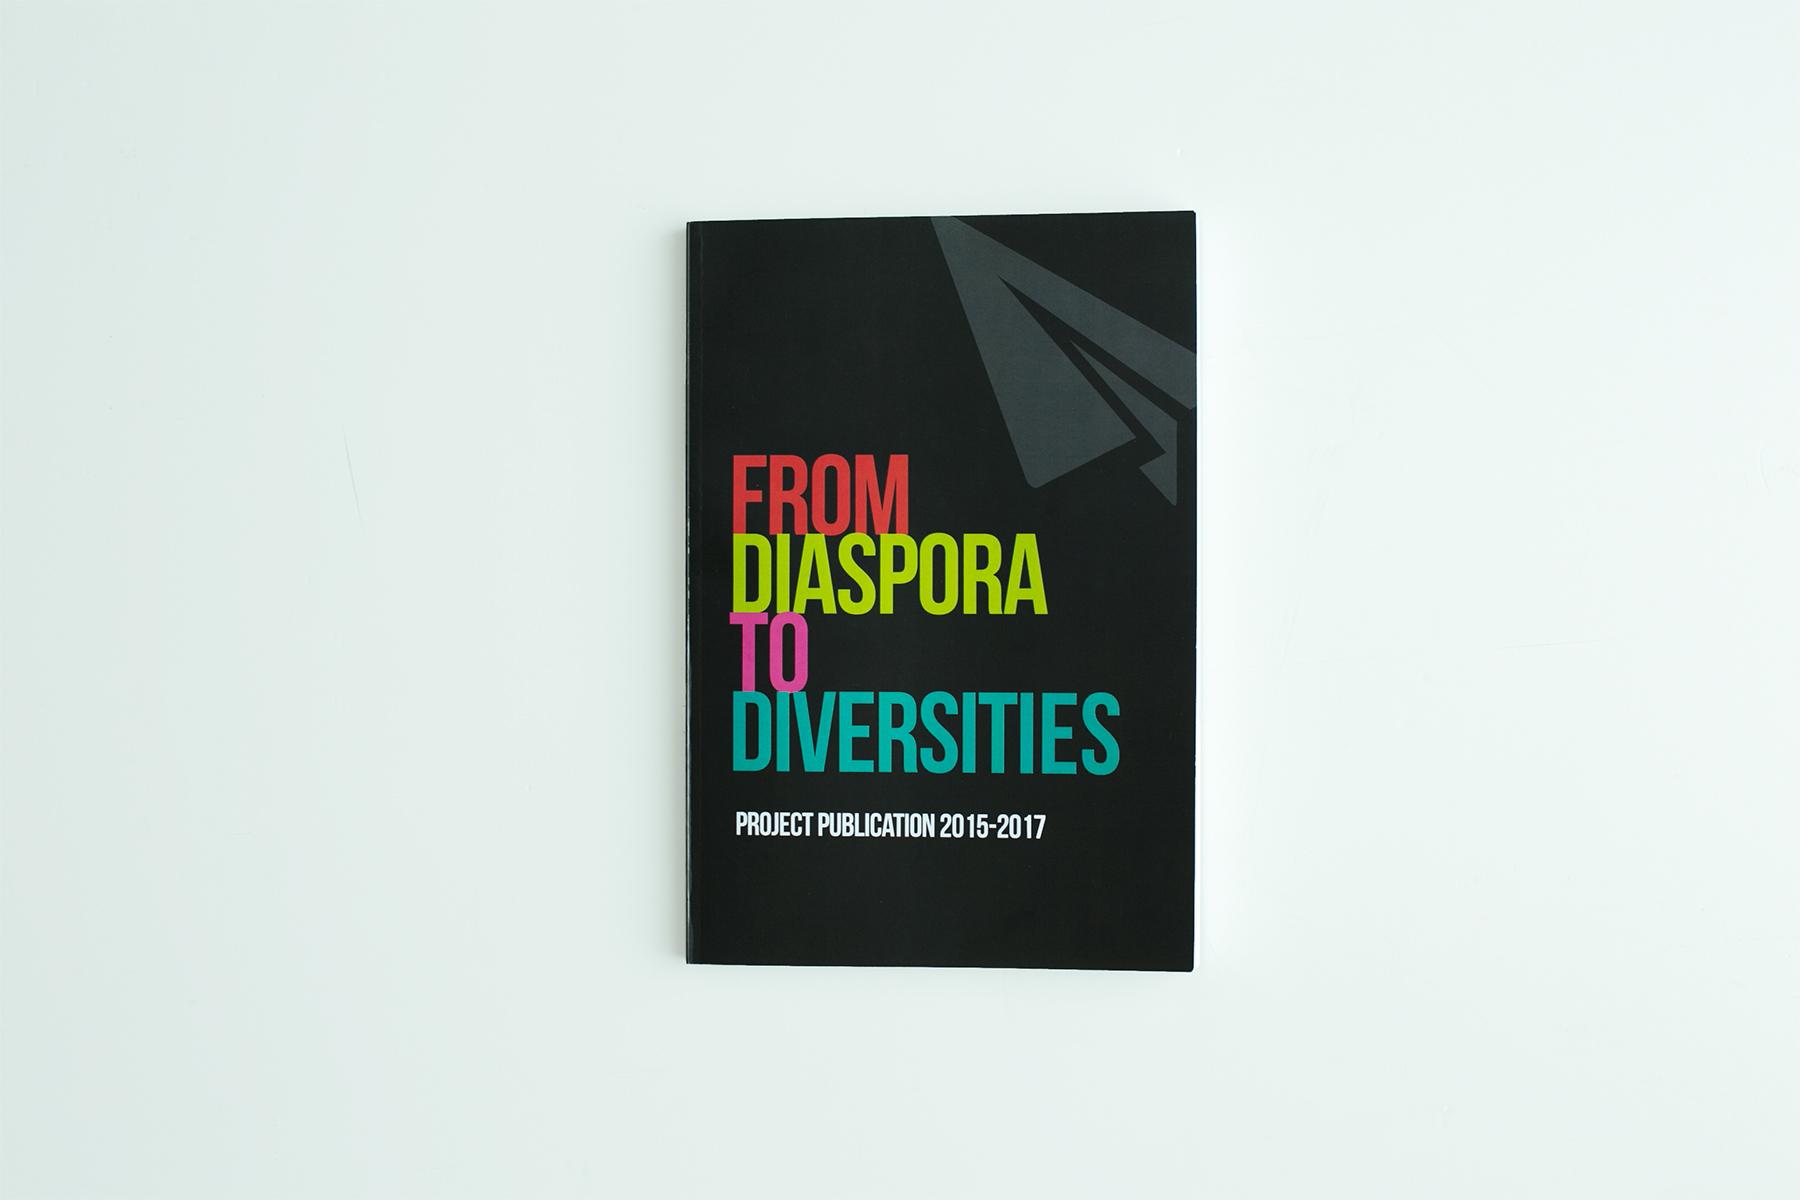 From diaspora to diversities